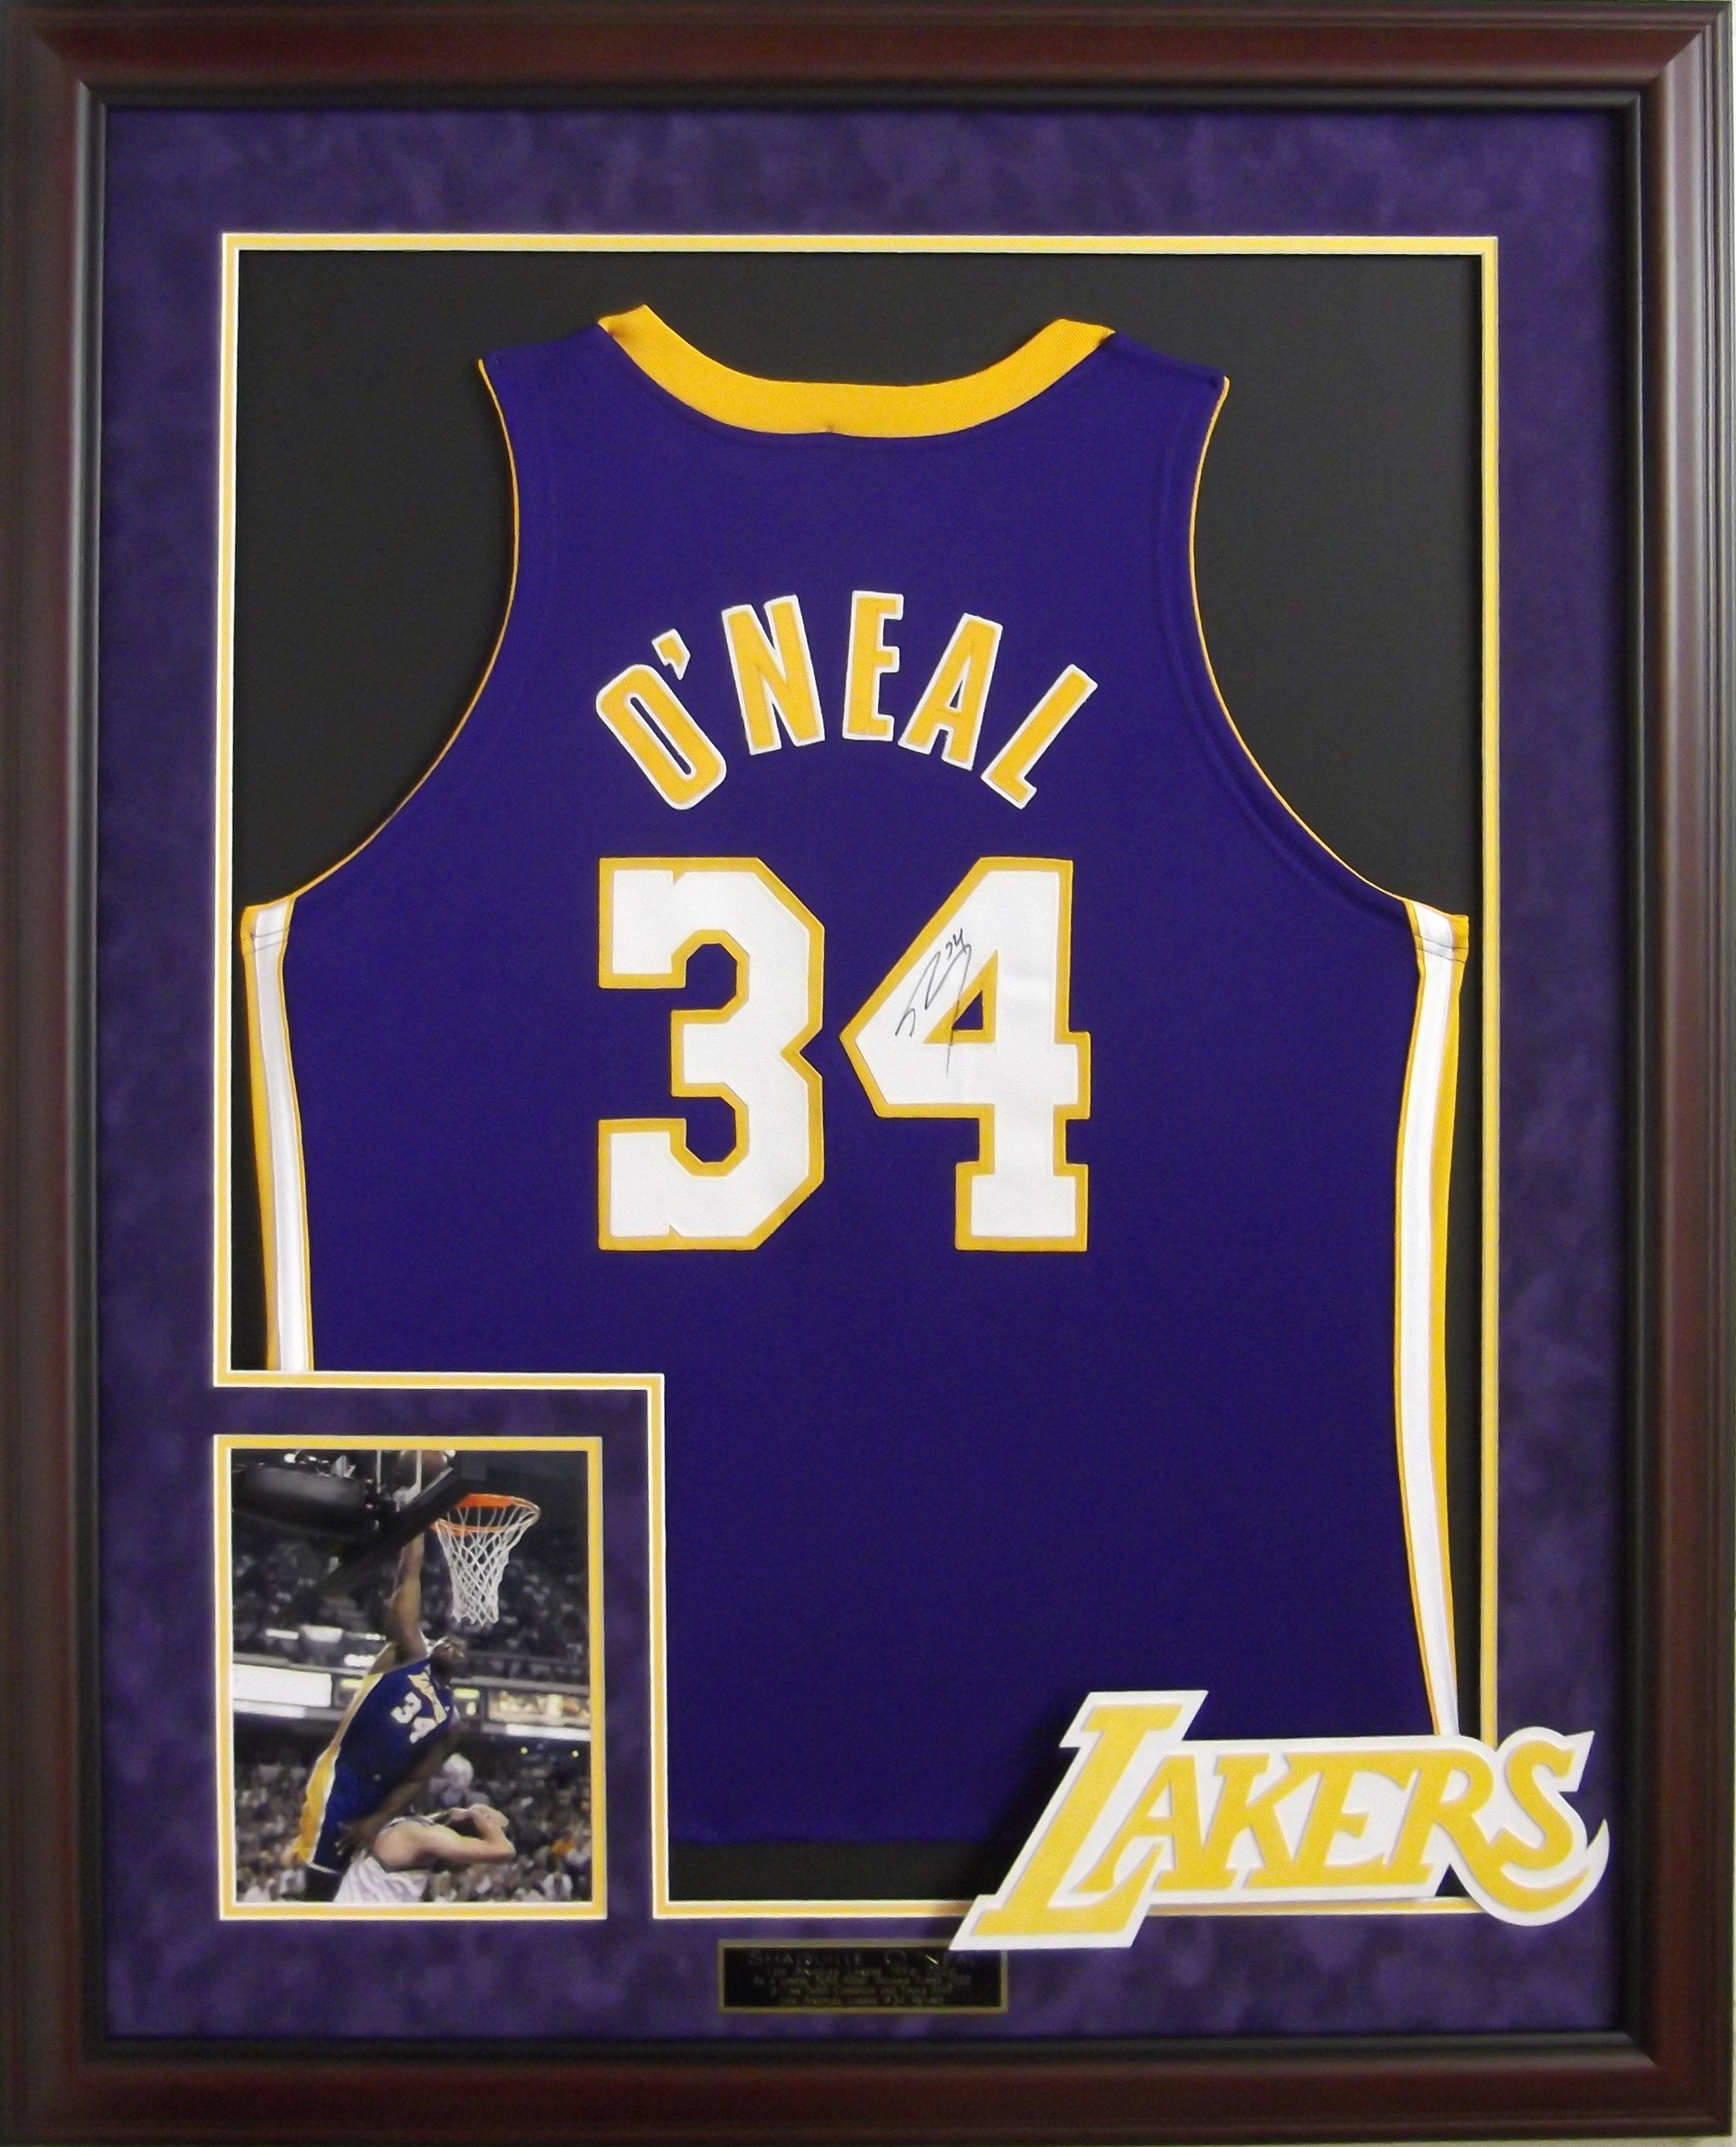 cfa64bab511 Shaq O Neal signed Lakers jersey framed  Shaq  Lakers  NBA  framedjersey